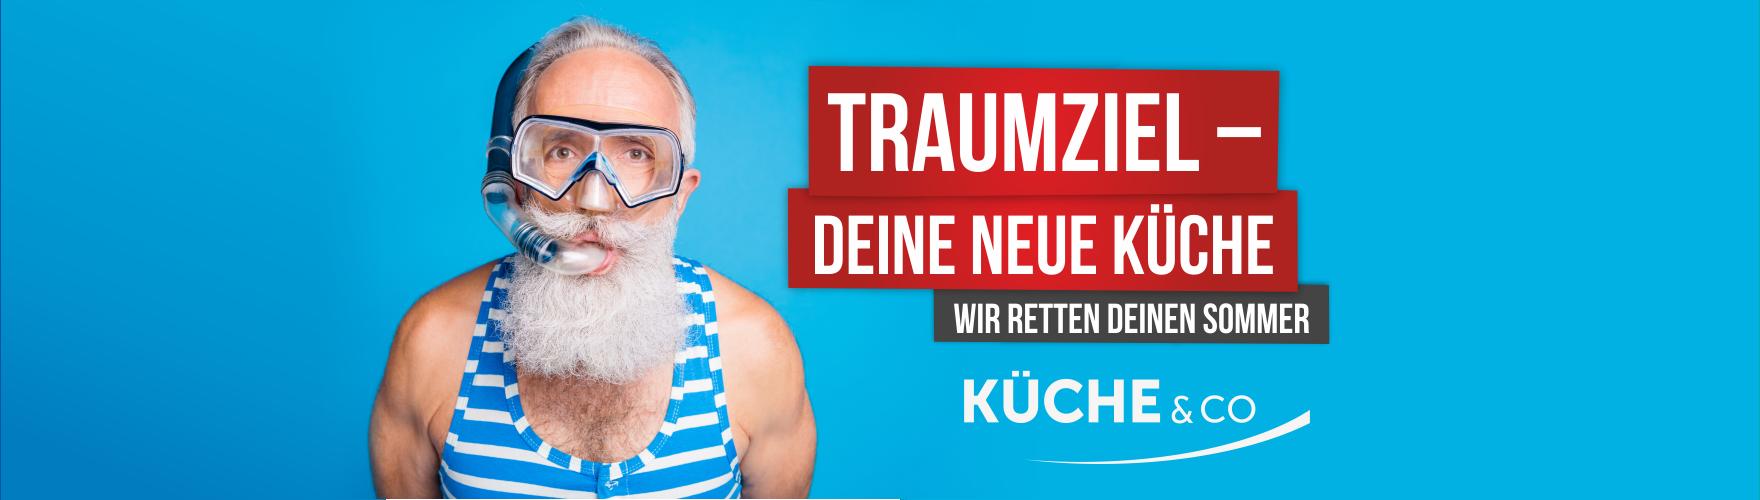 KüCo_Anzeige_Traumziel_Website_Apr2020.